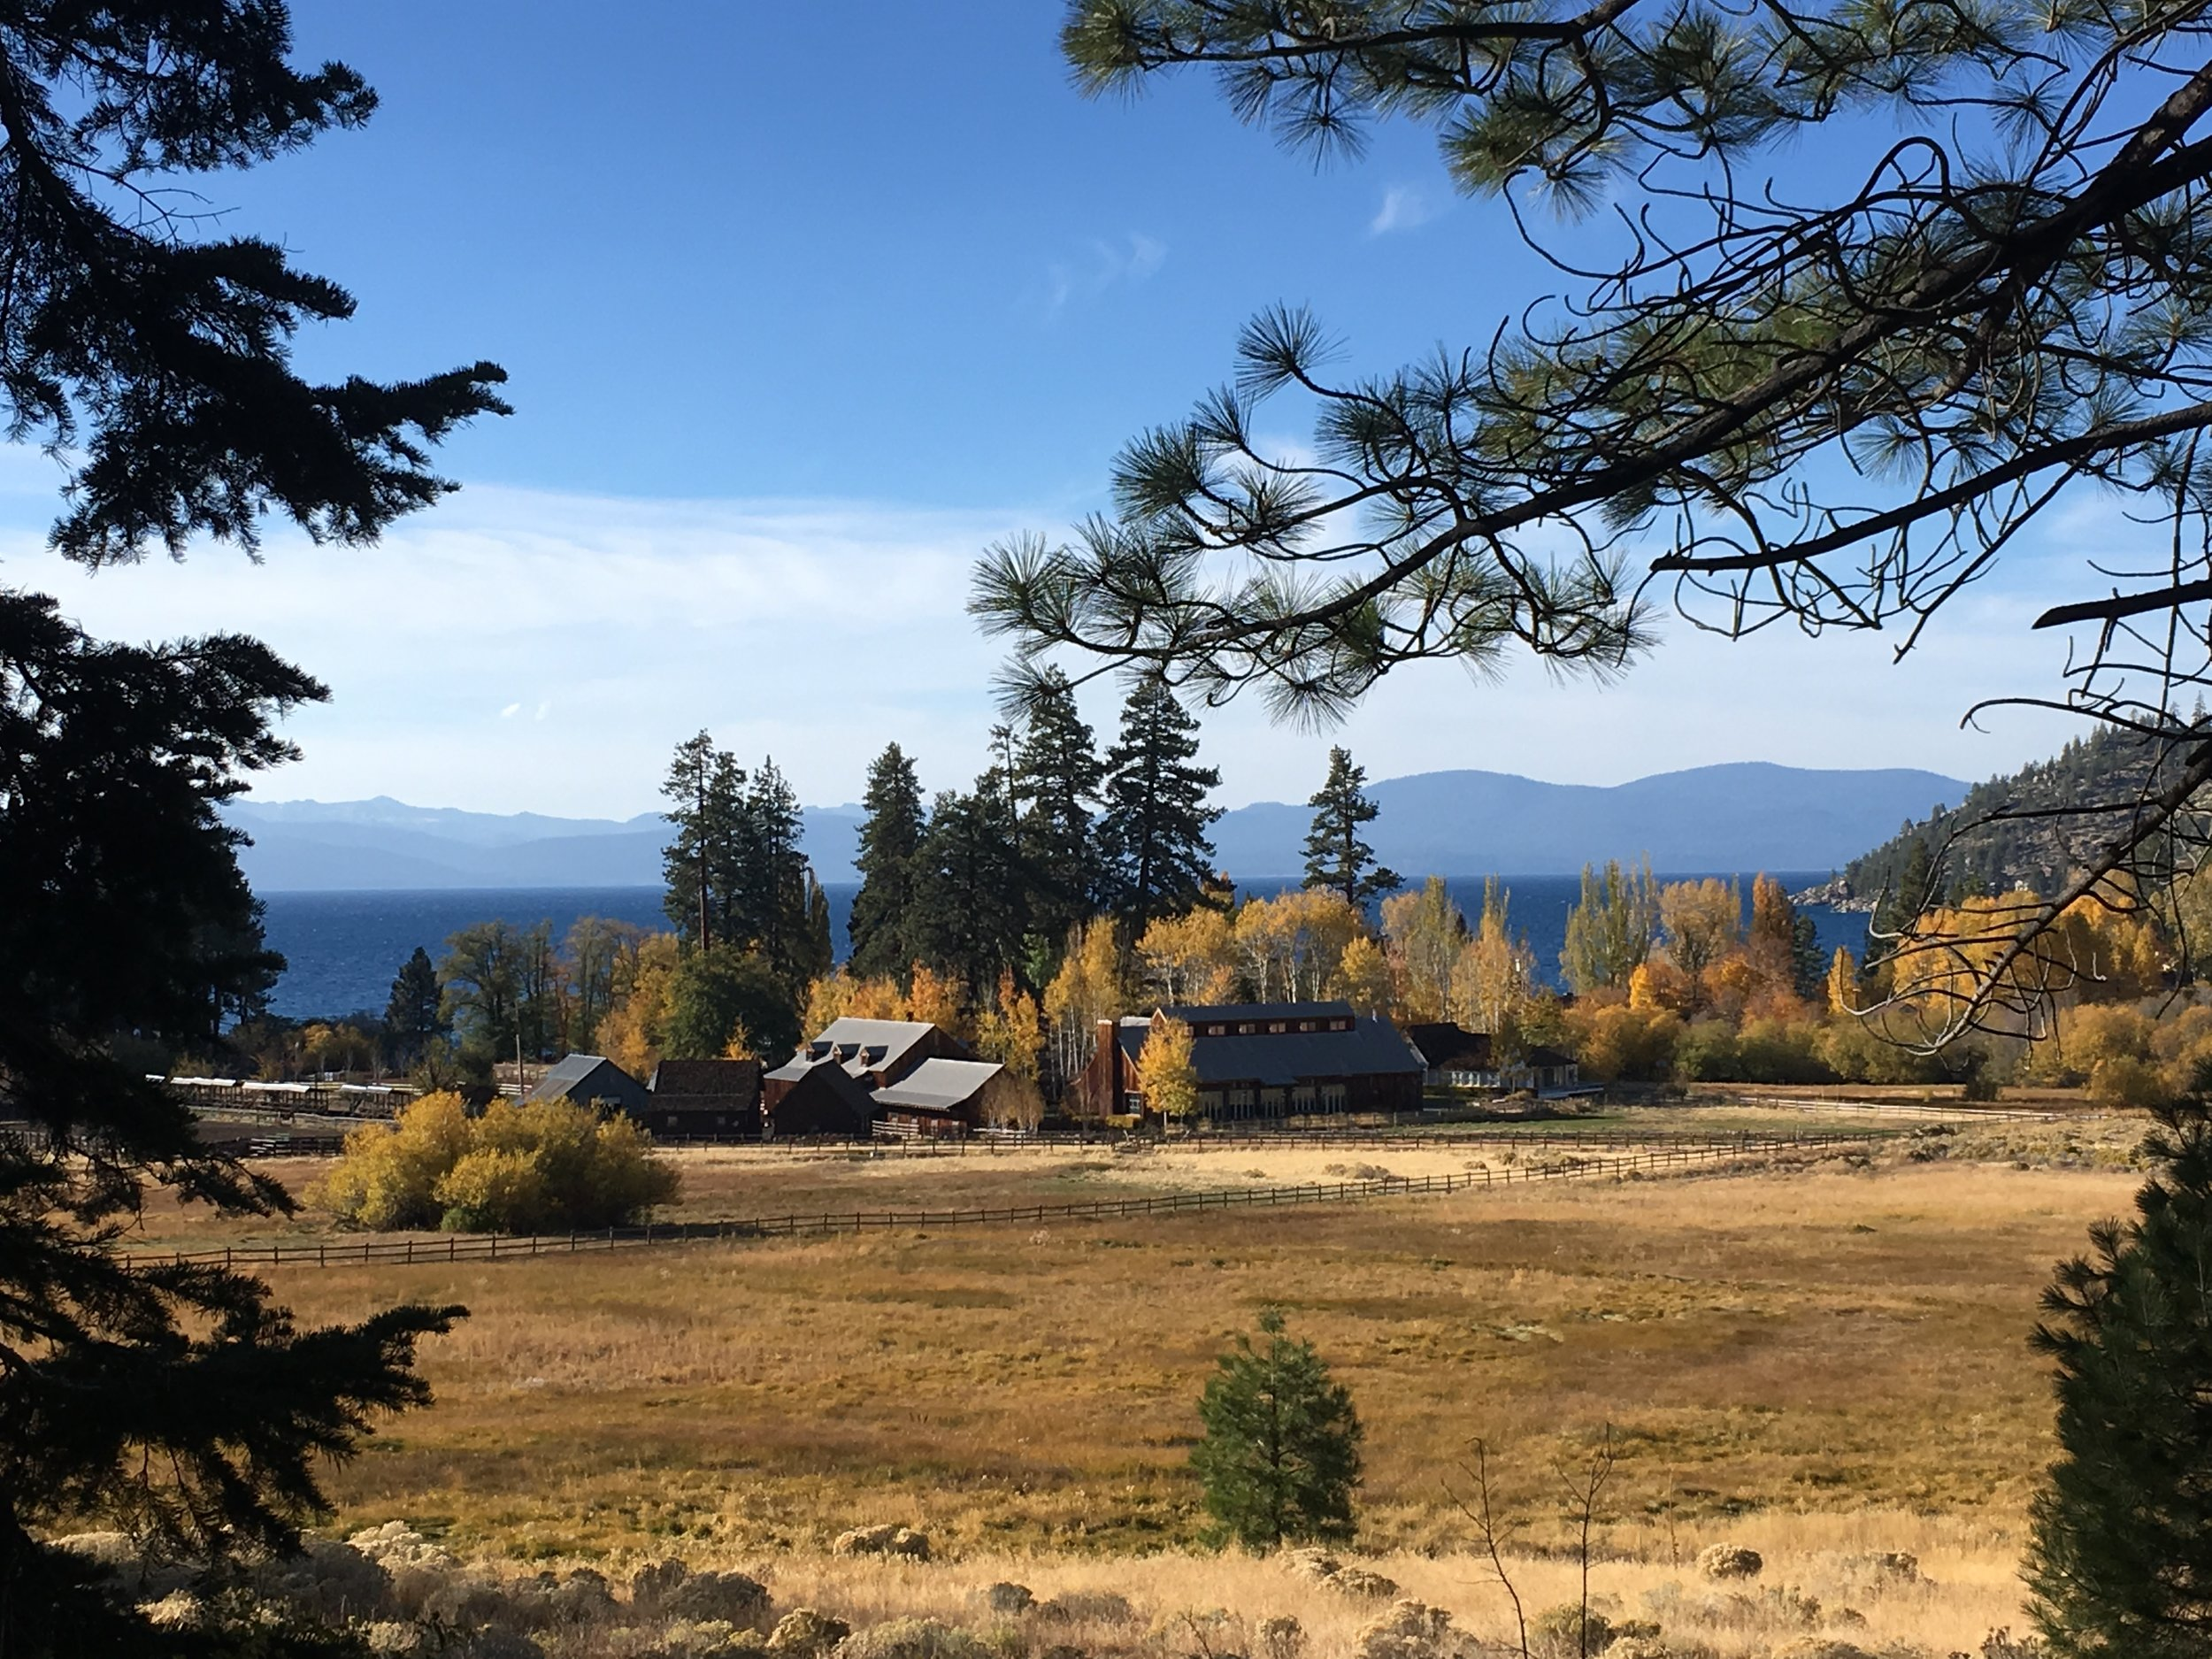 Lake Tahoe, NV -November 2016